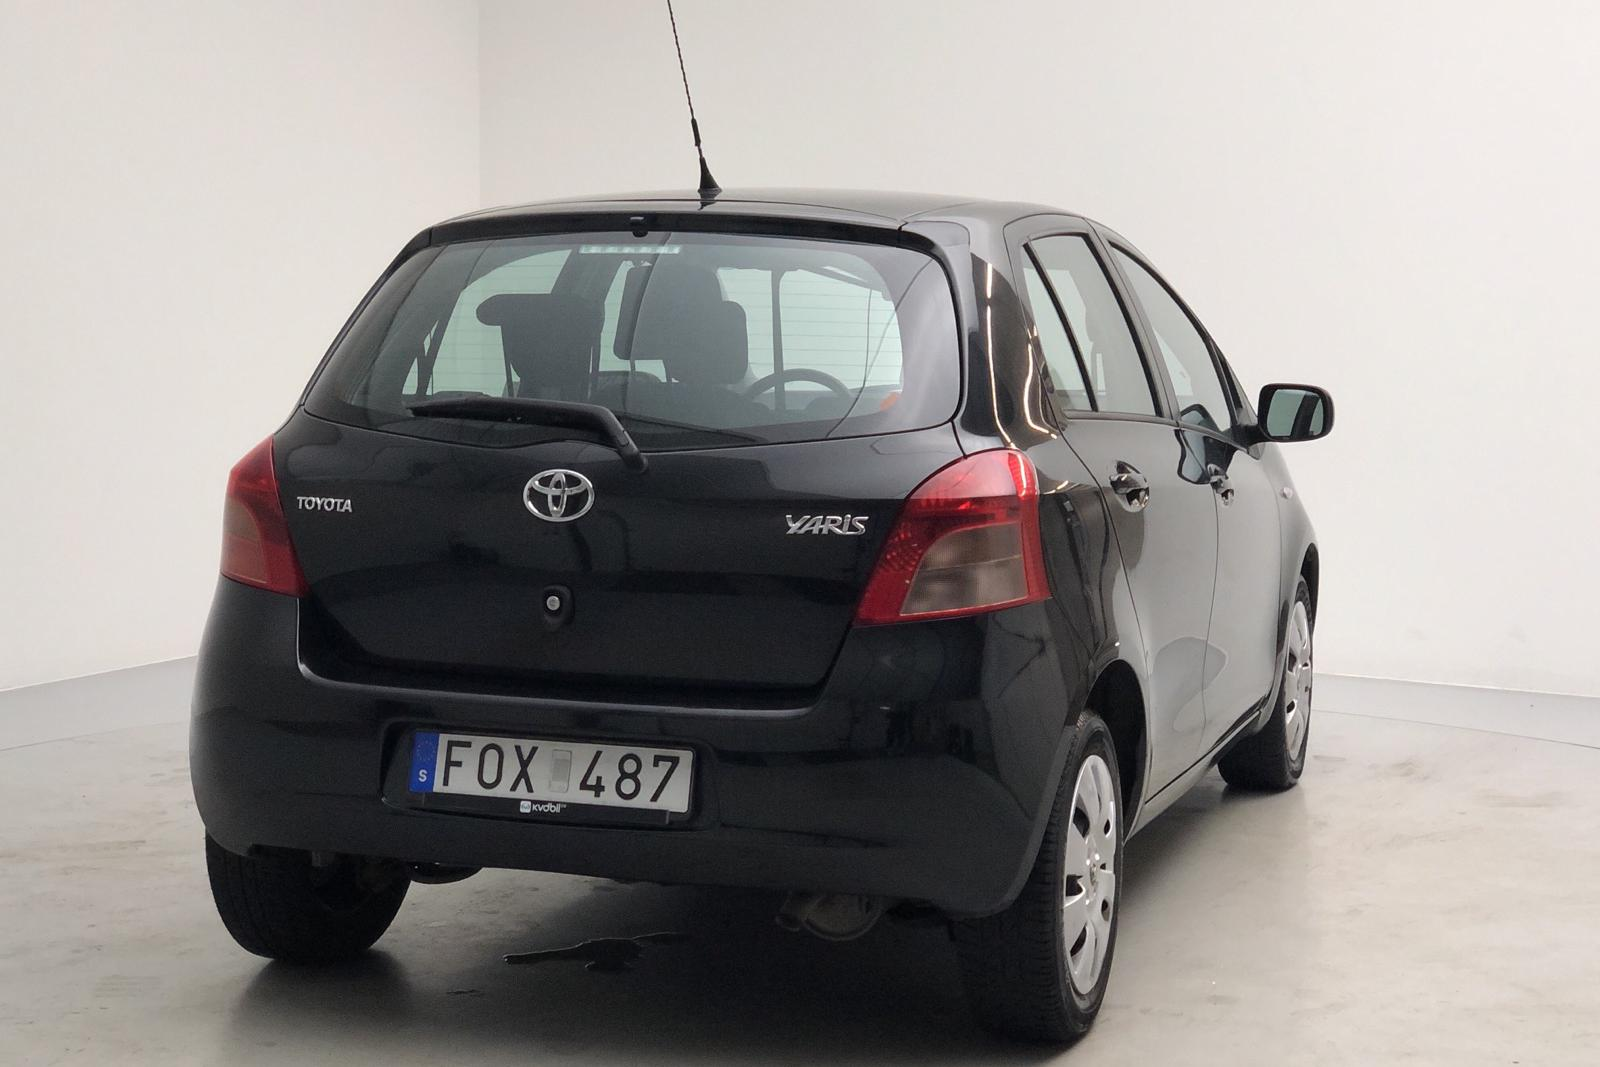 Toyota Yaris 1.3 5dr (87hk) - 14 000 mil - Manuell - svart - 2007